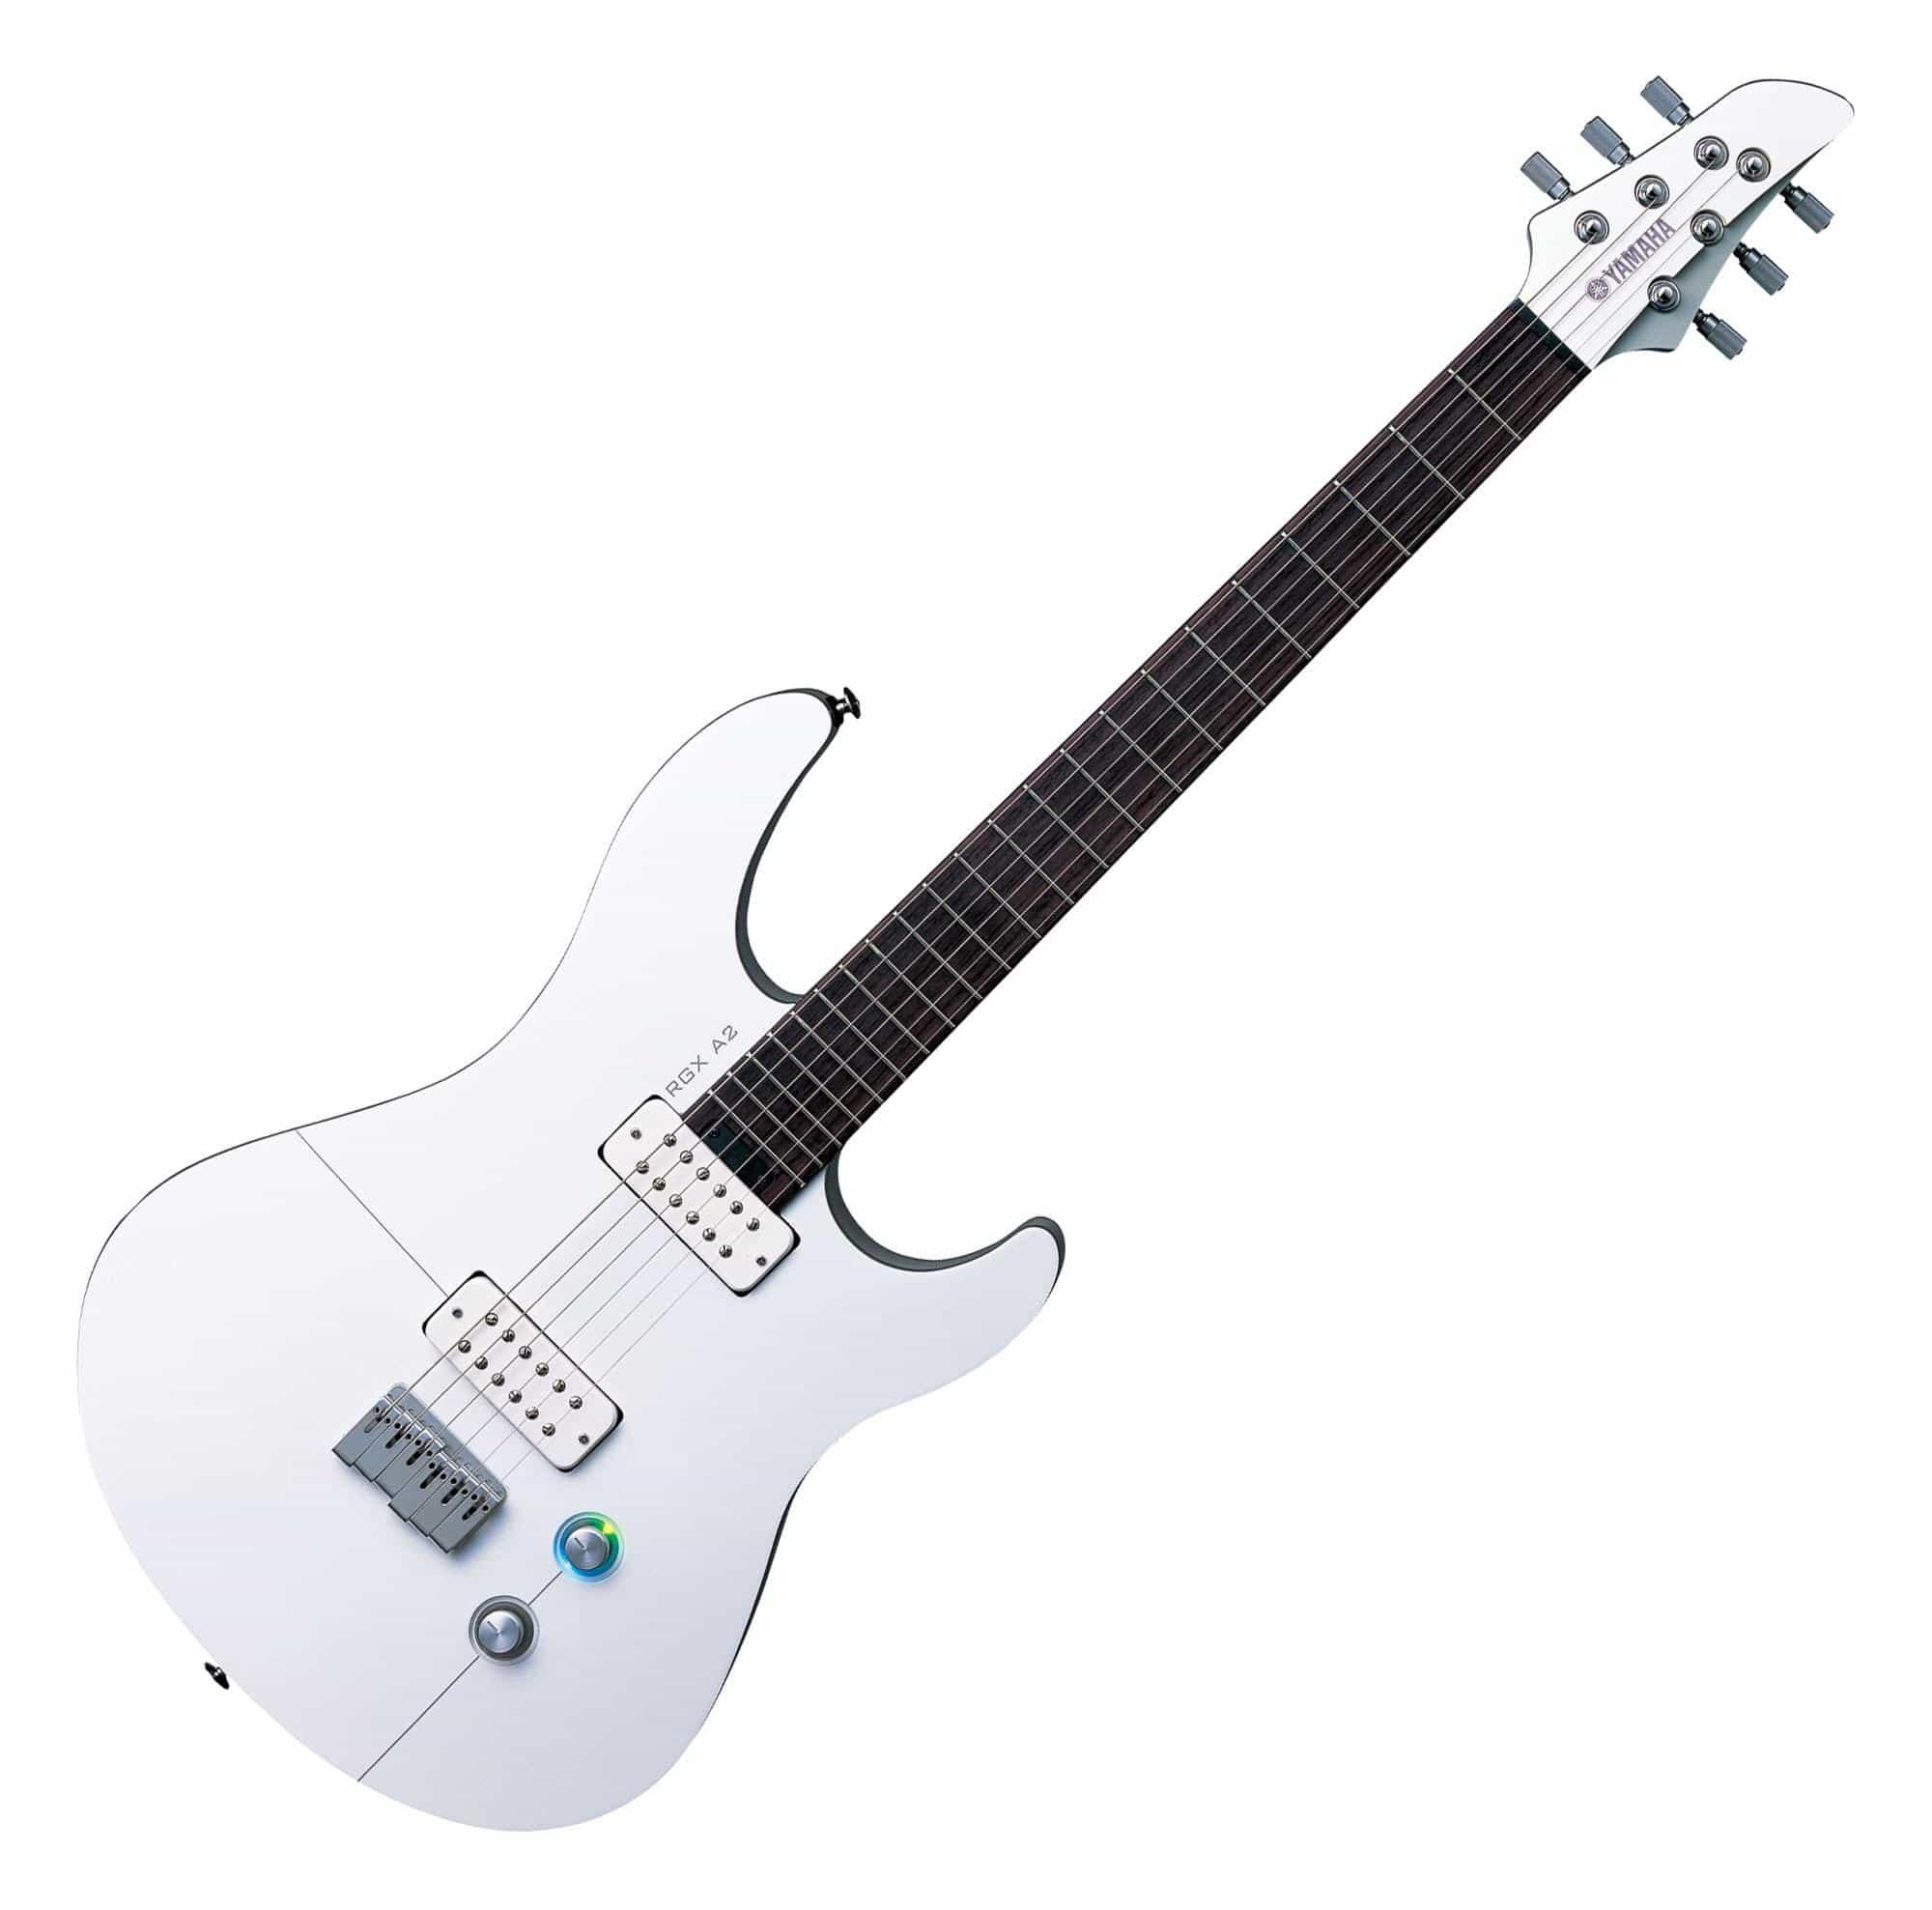 yamaha rgx a2 e gitarre white aircraft grey. Black Bedroom Furniture Sets. Home Design Ideas